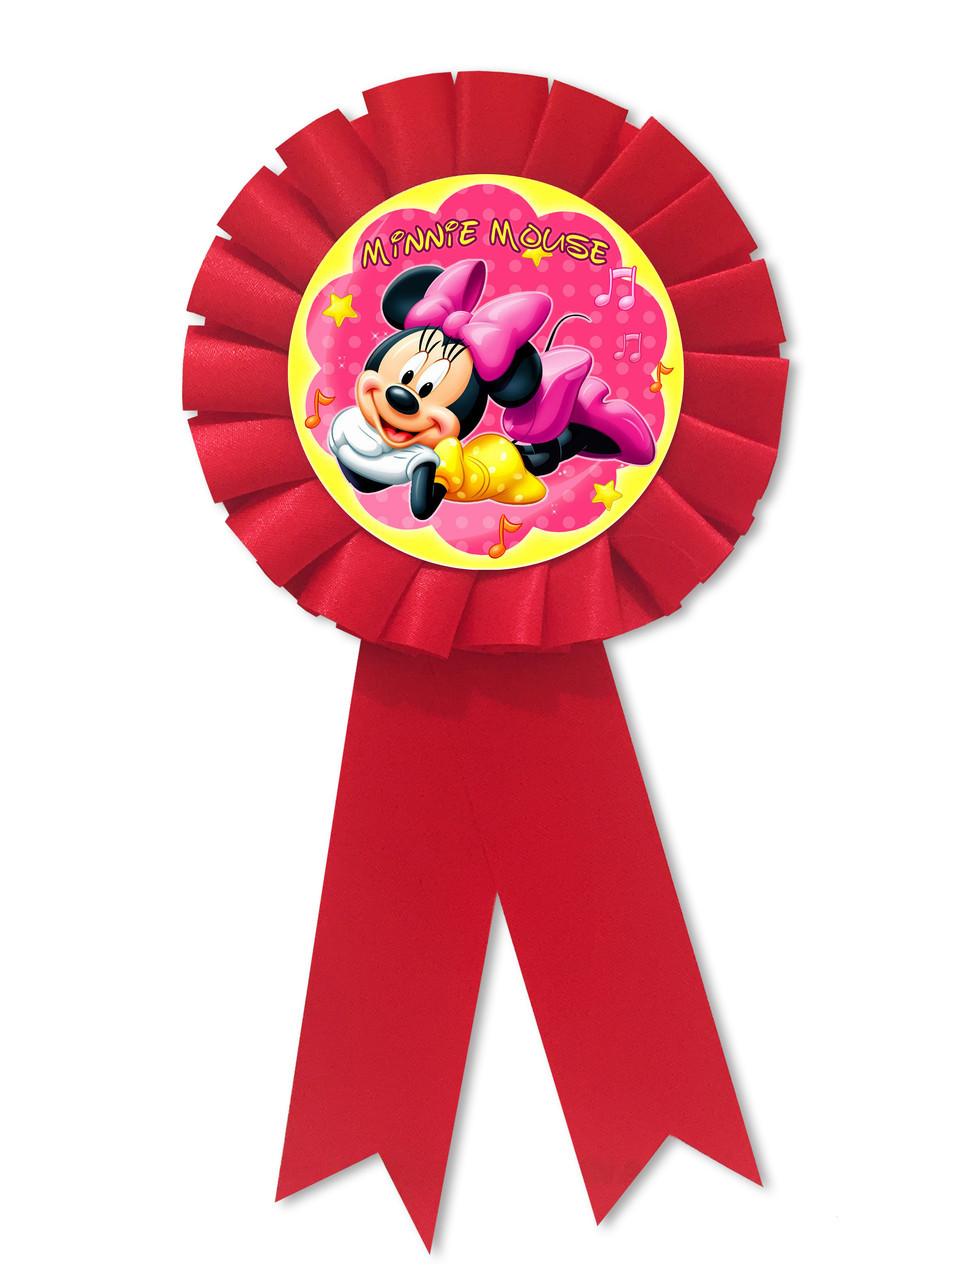 Медаль Мини Маус